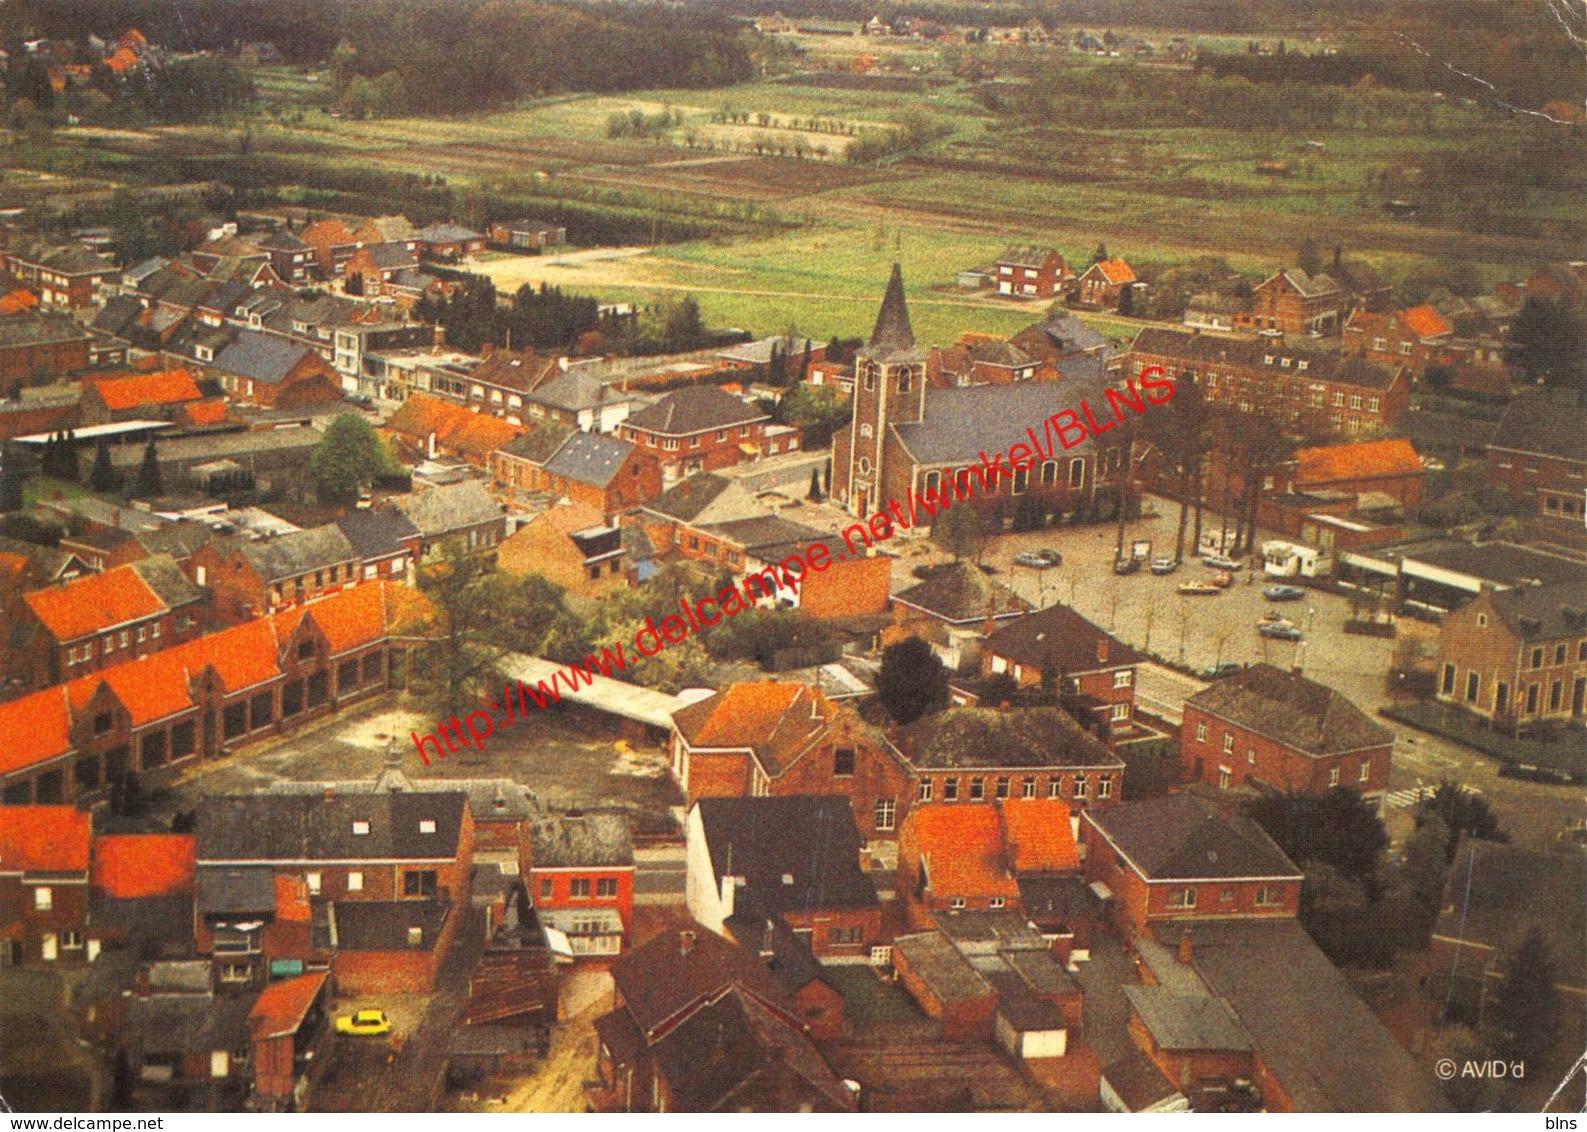 Lente 1985 - Centrum Met Zicht Op Kerk School En Calvenne - Tremelo - Tremelo